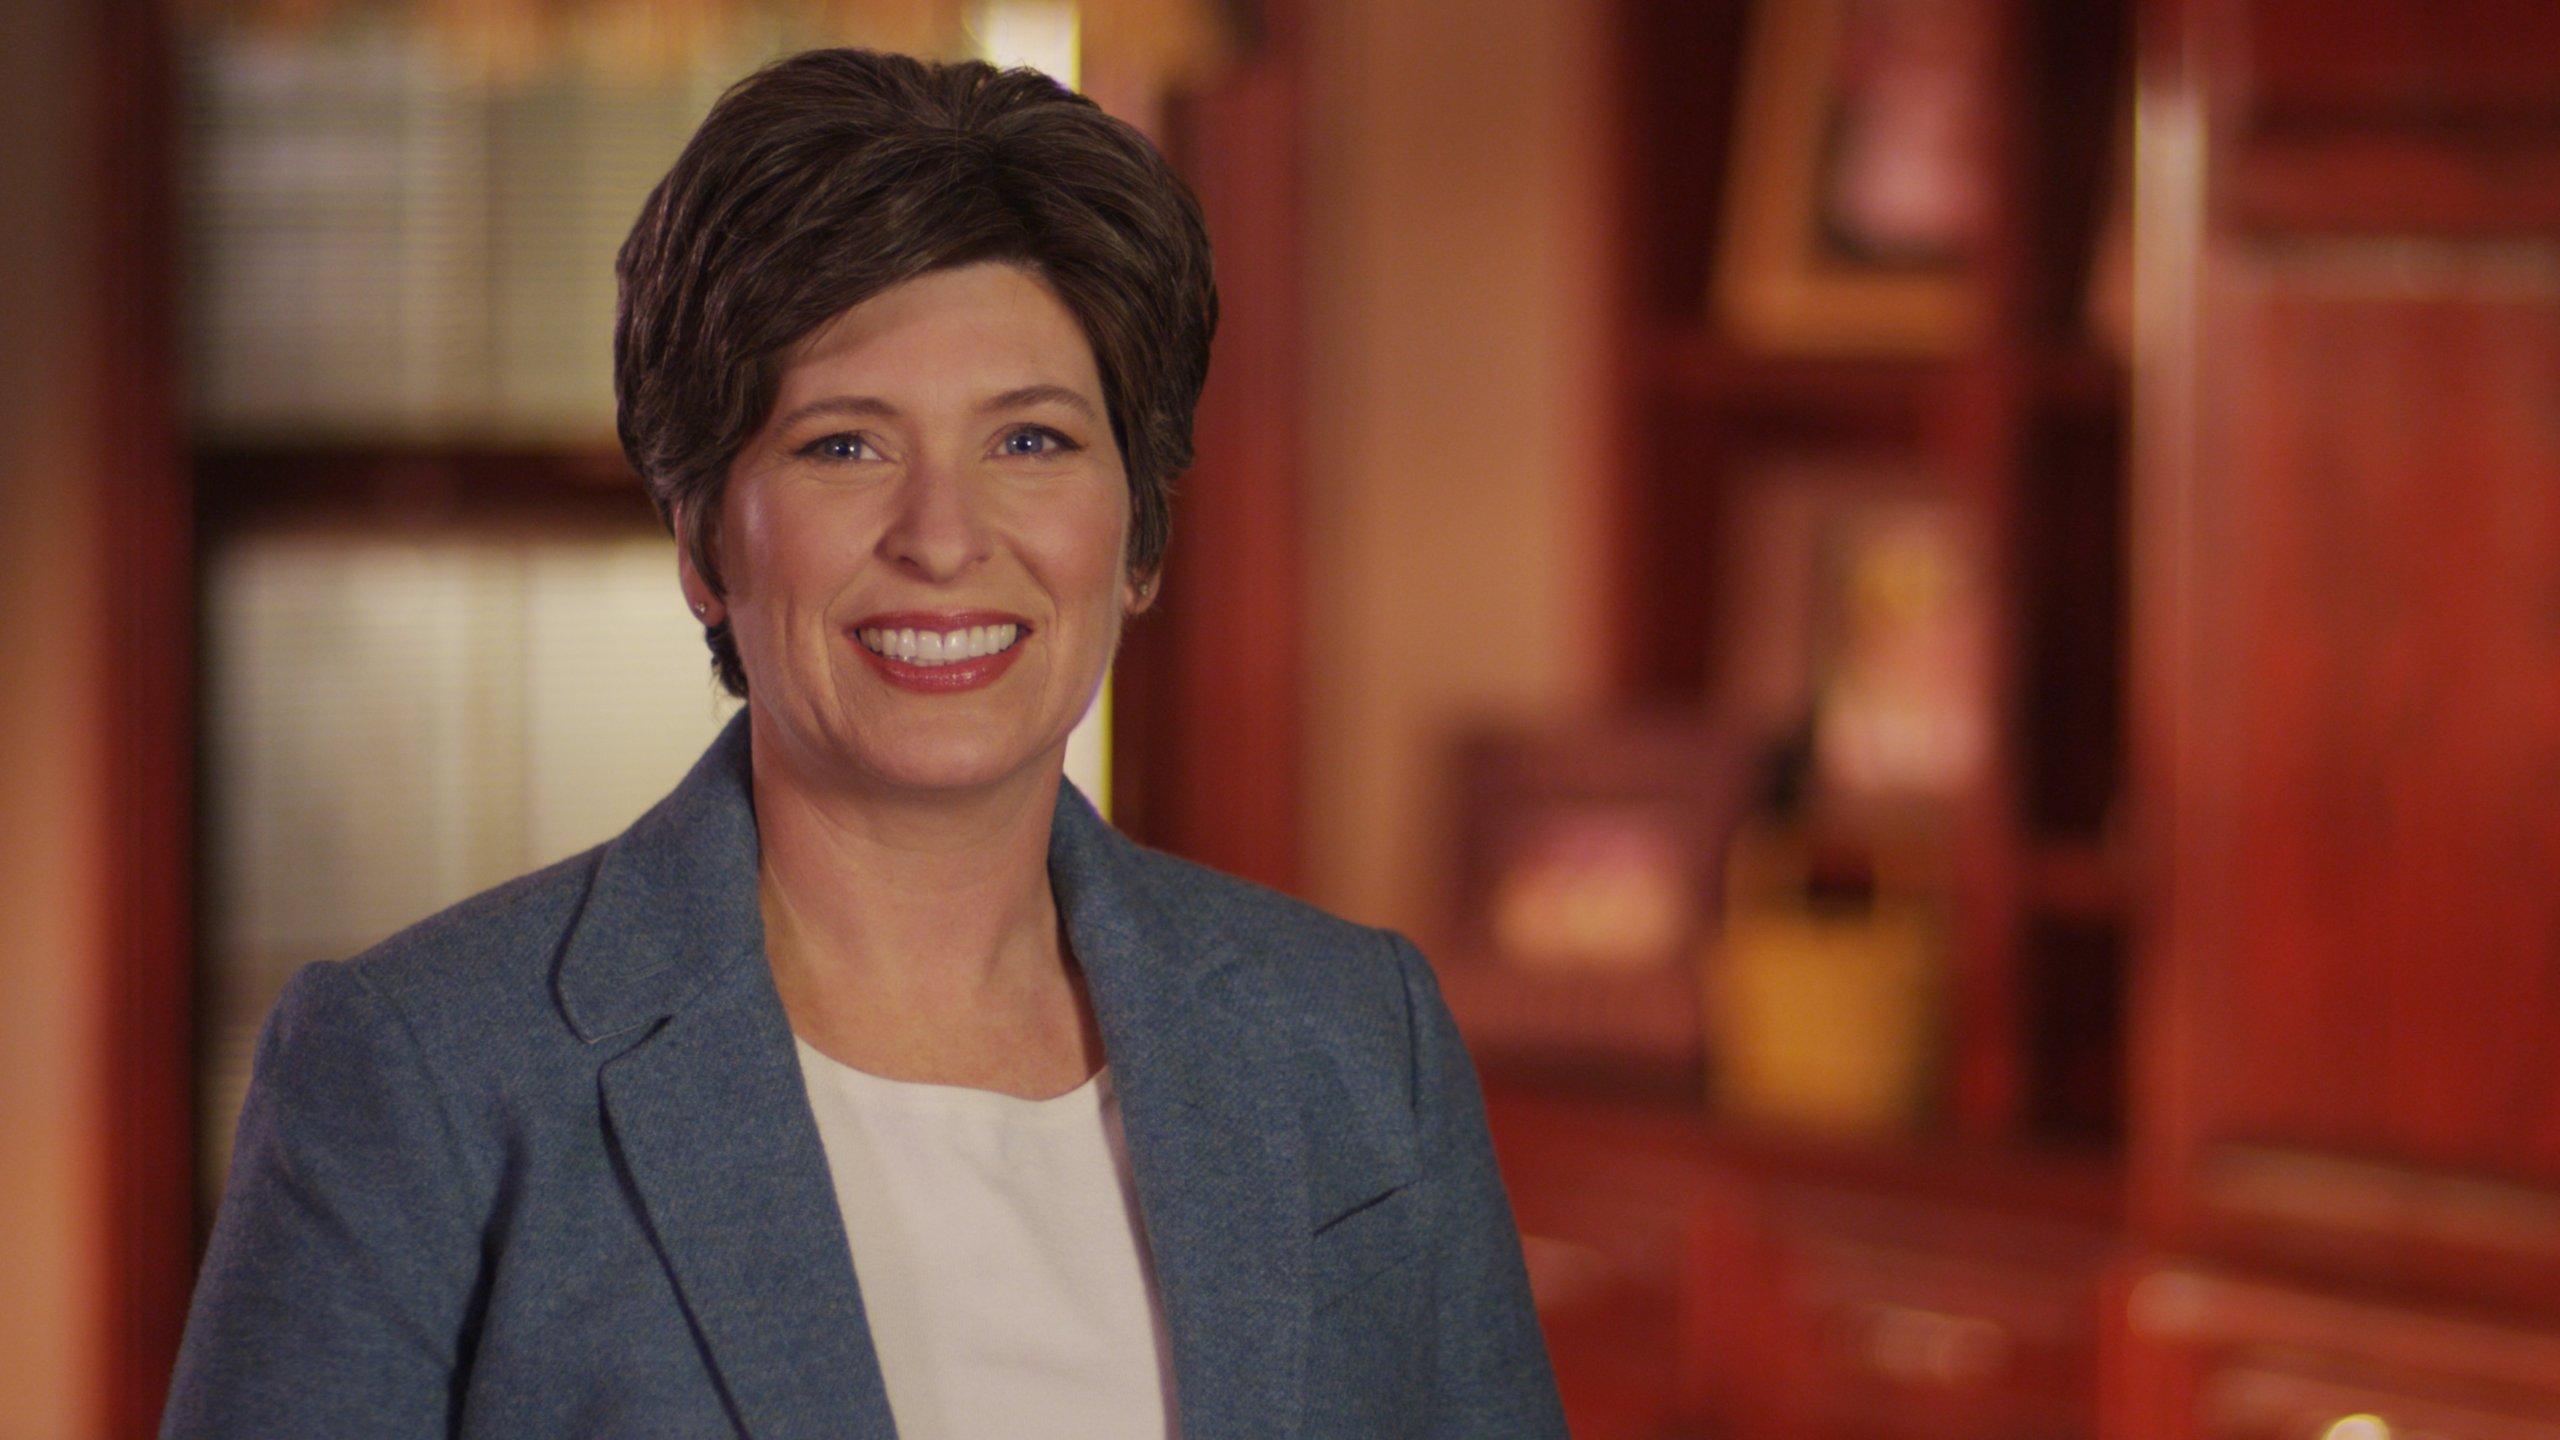 Joni Ernst, (R) Iowa, is the junior United States Senator from Iowa, elected November, 2014.